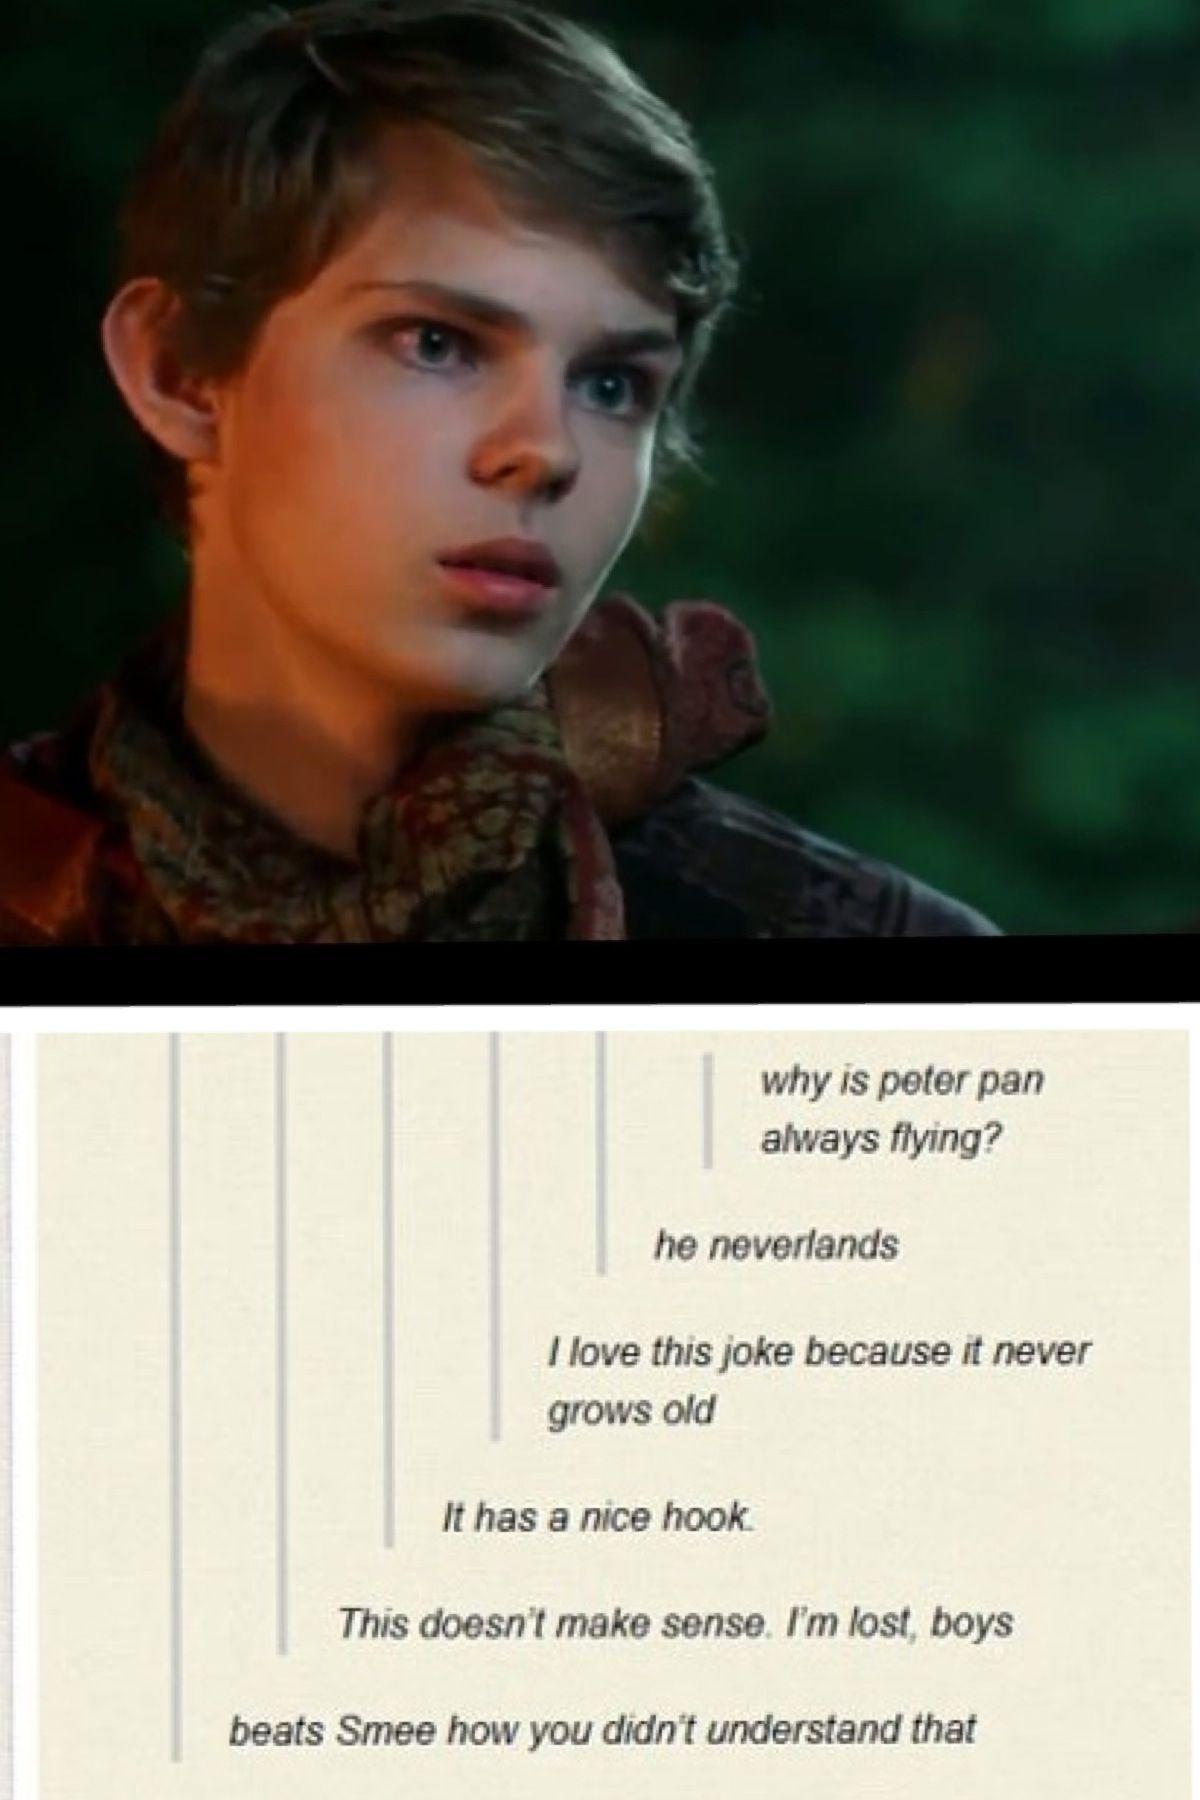 Once upon a time Peter pan jokes